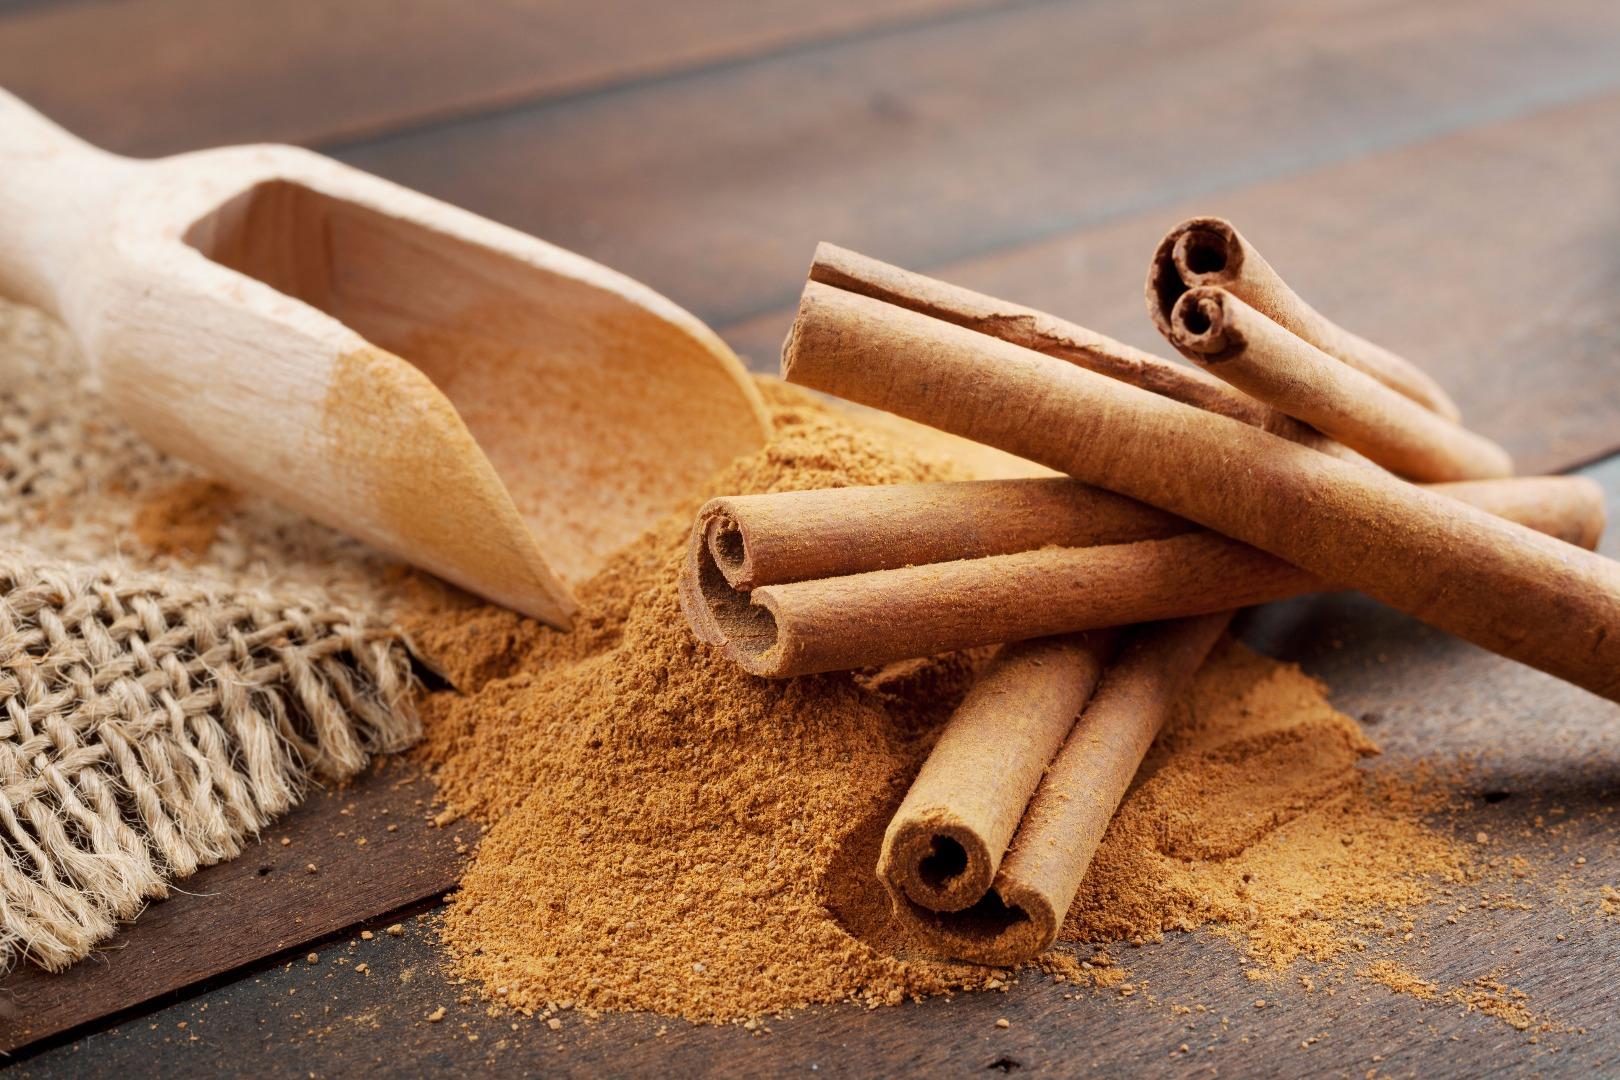 Cinnamon shown to burn fat